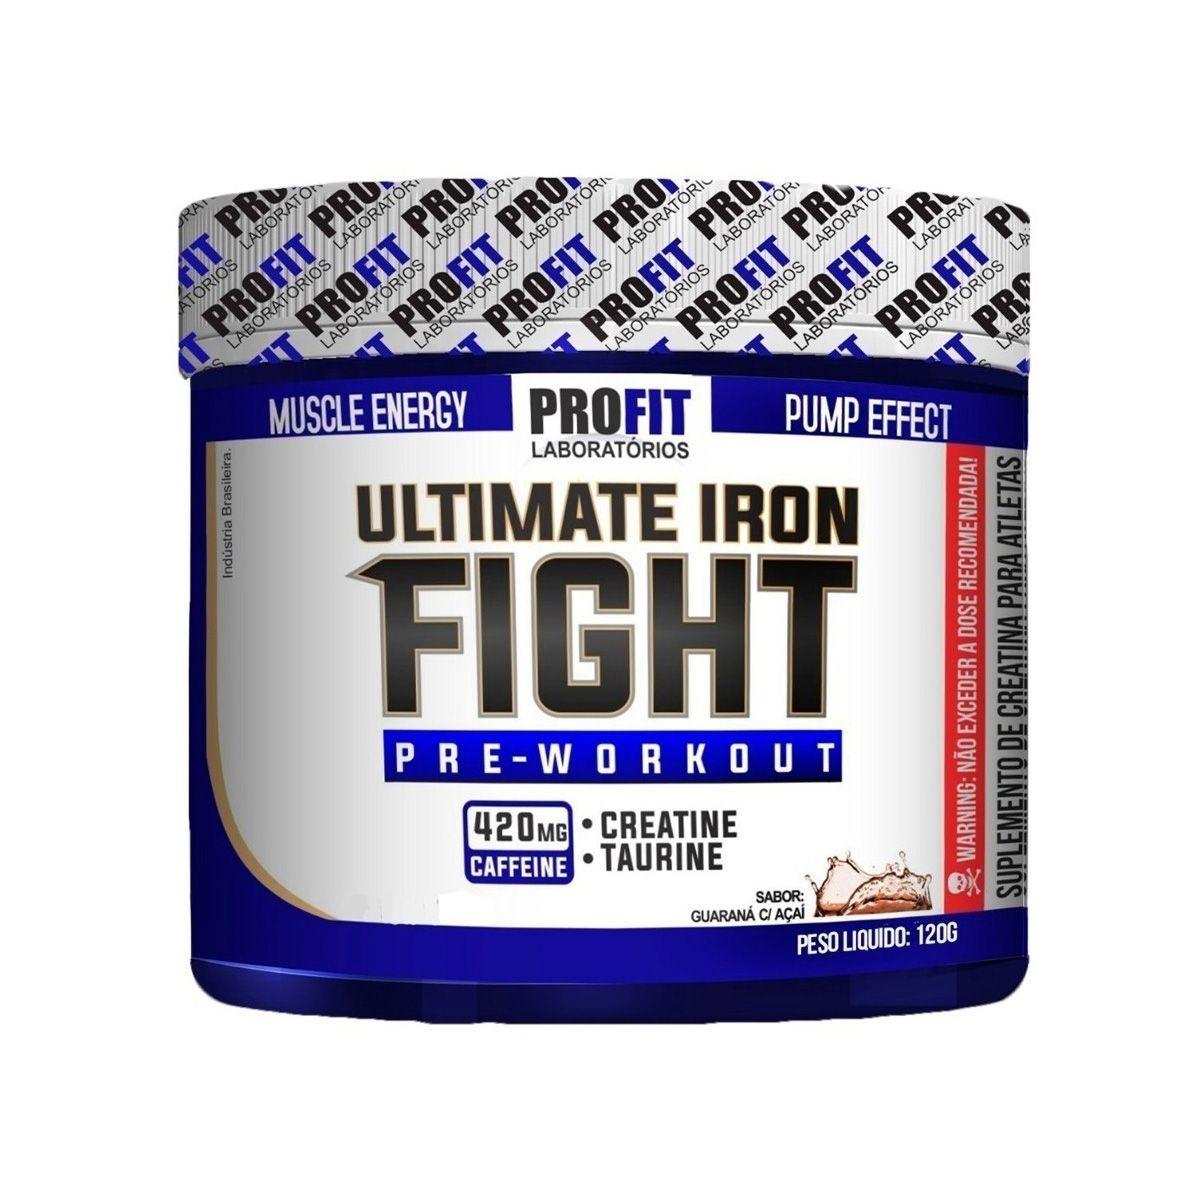 Ultimate Iron Fight - 120g - Profit